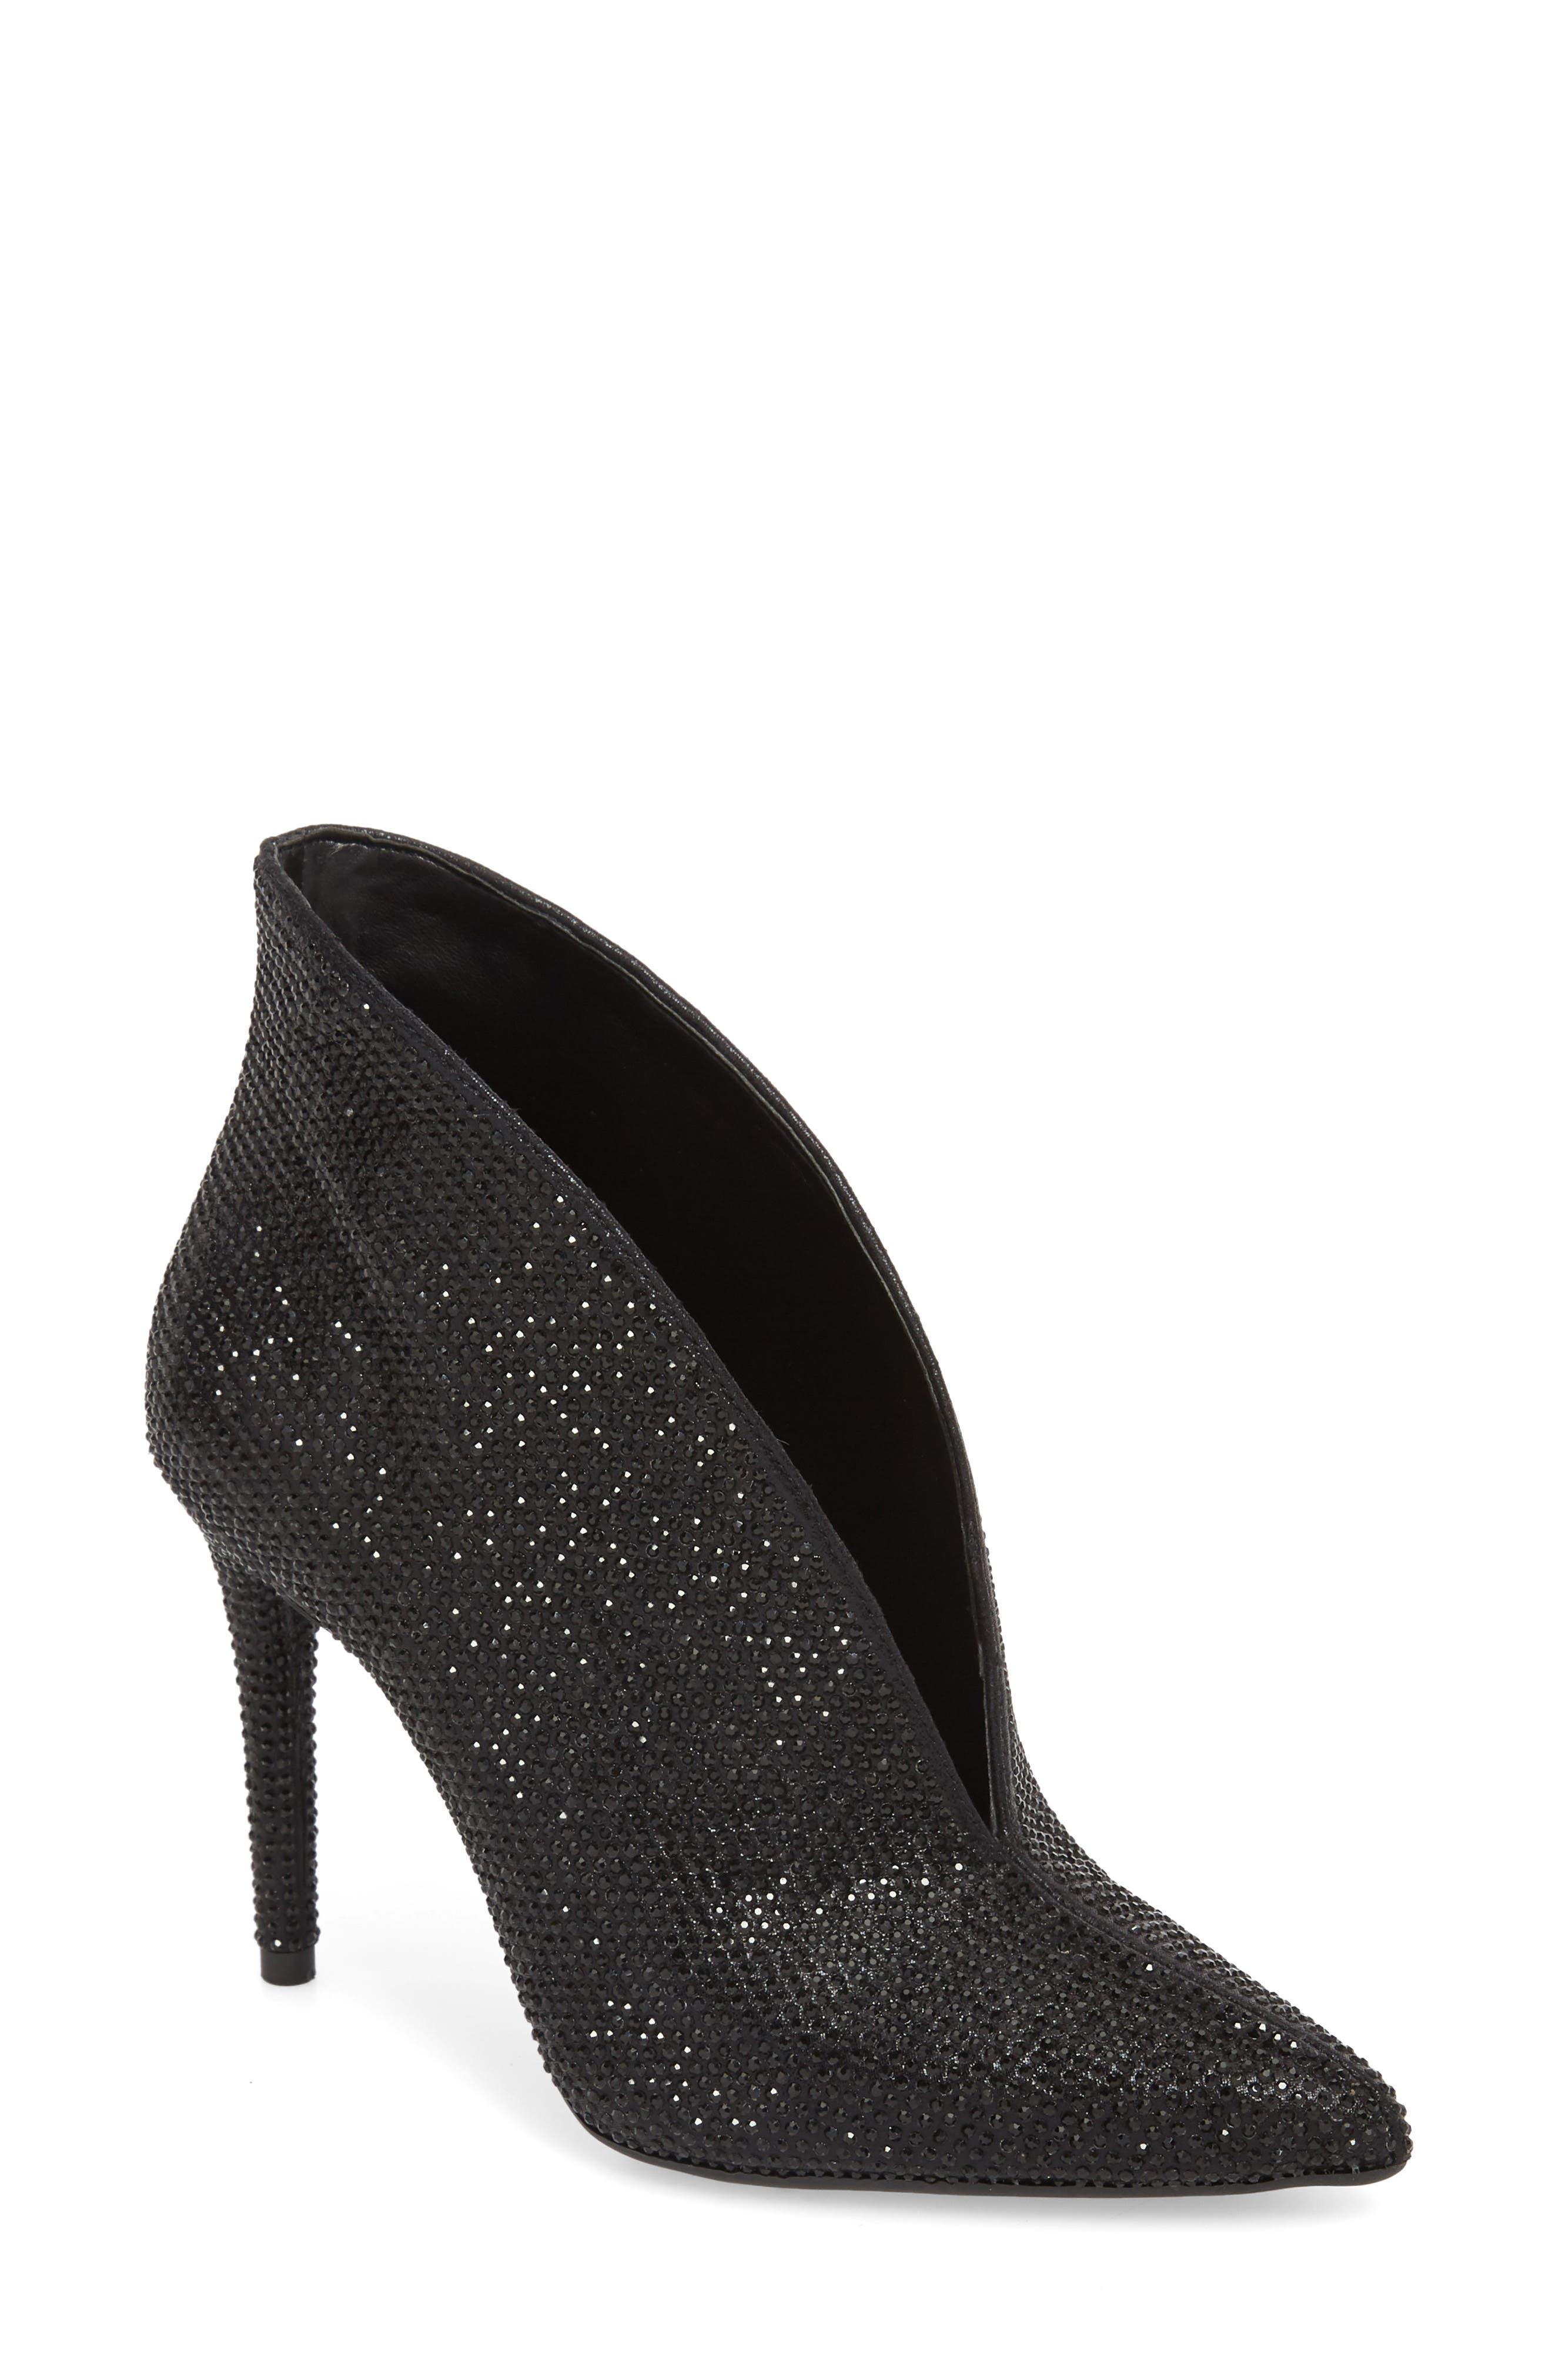 Jessica Simpson Lasnia Embellished Bootie- Black